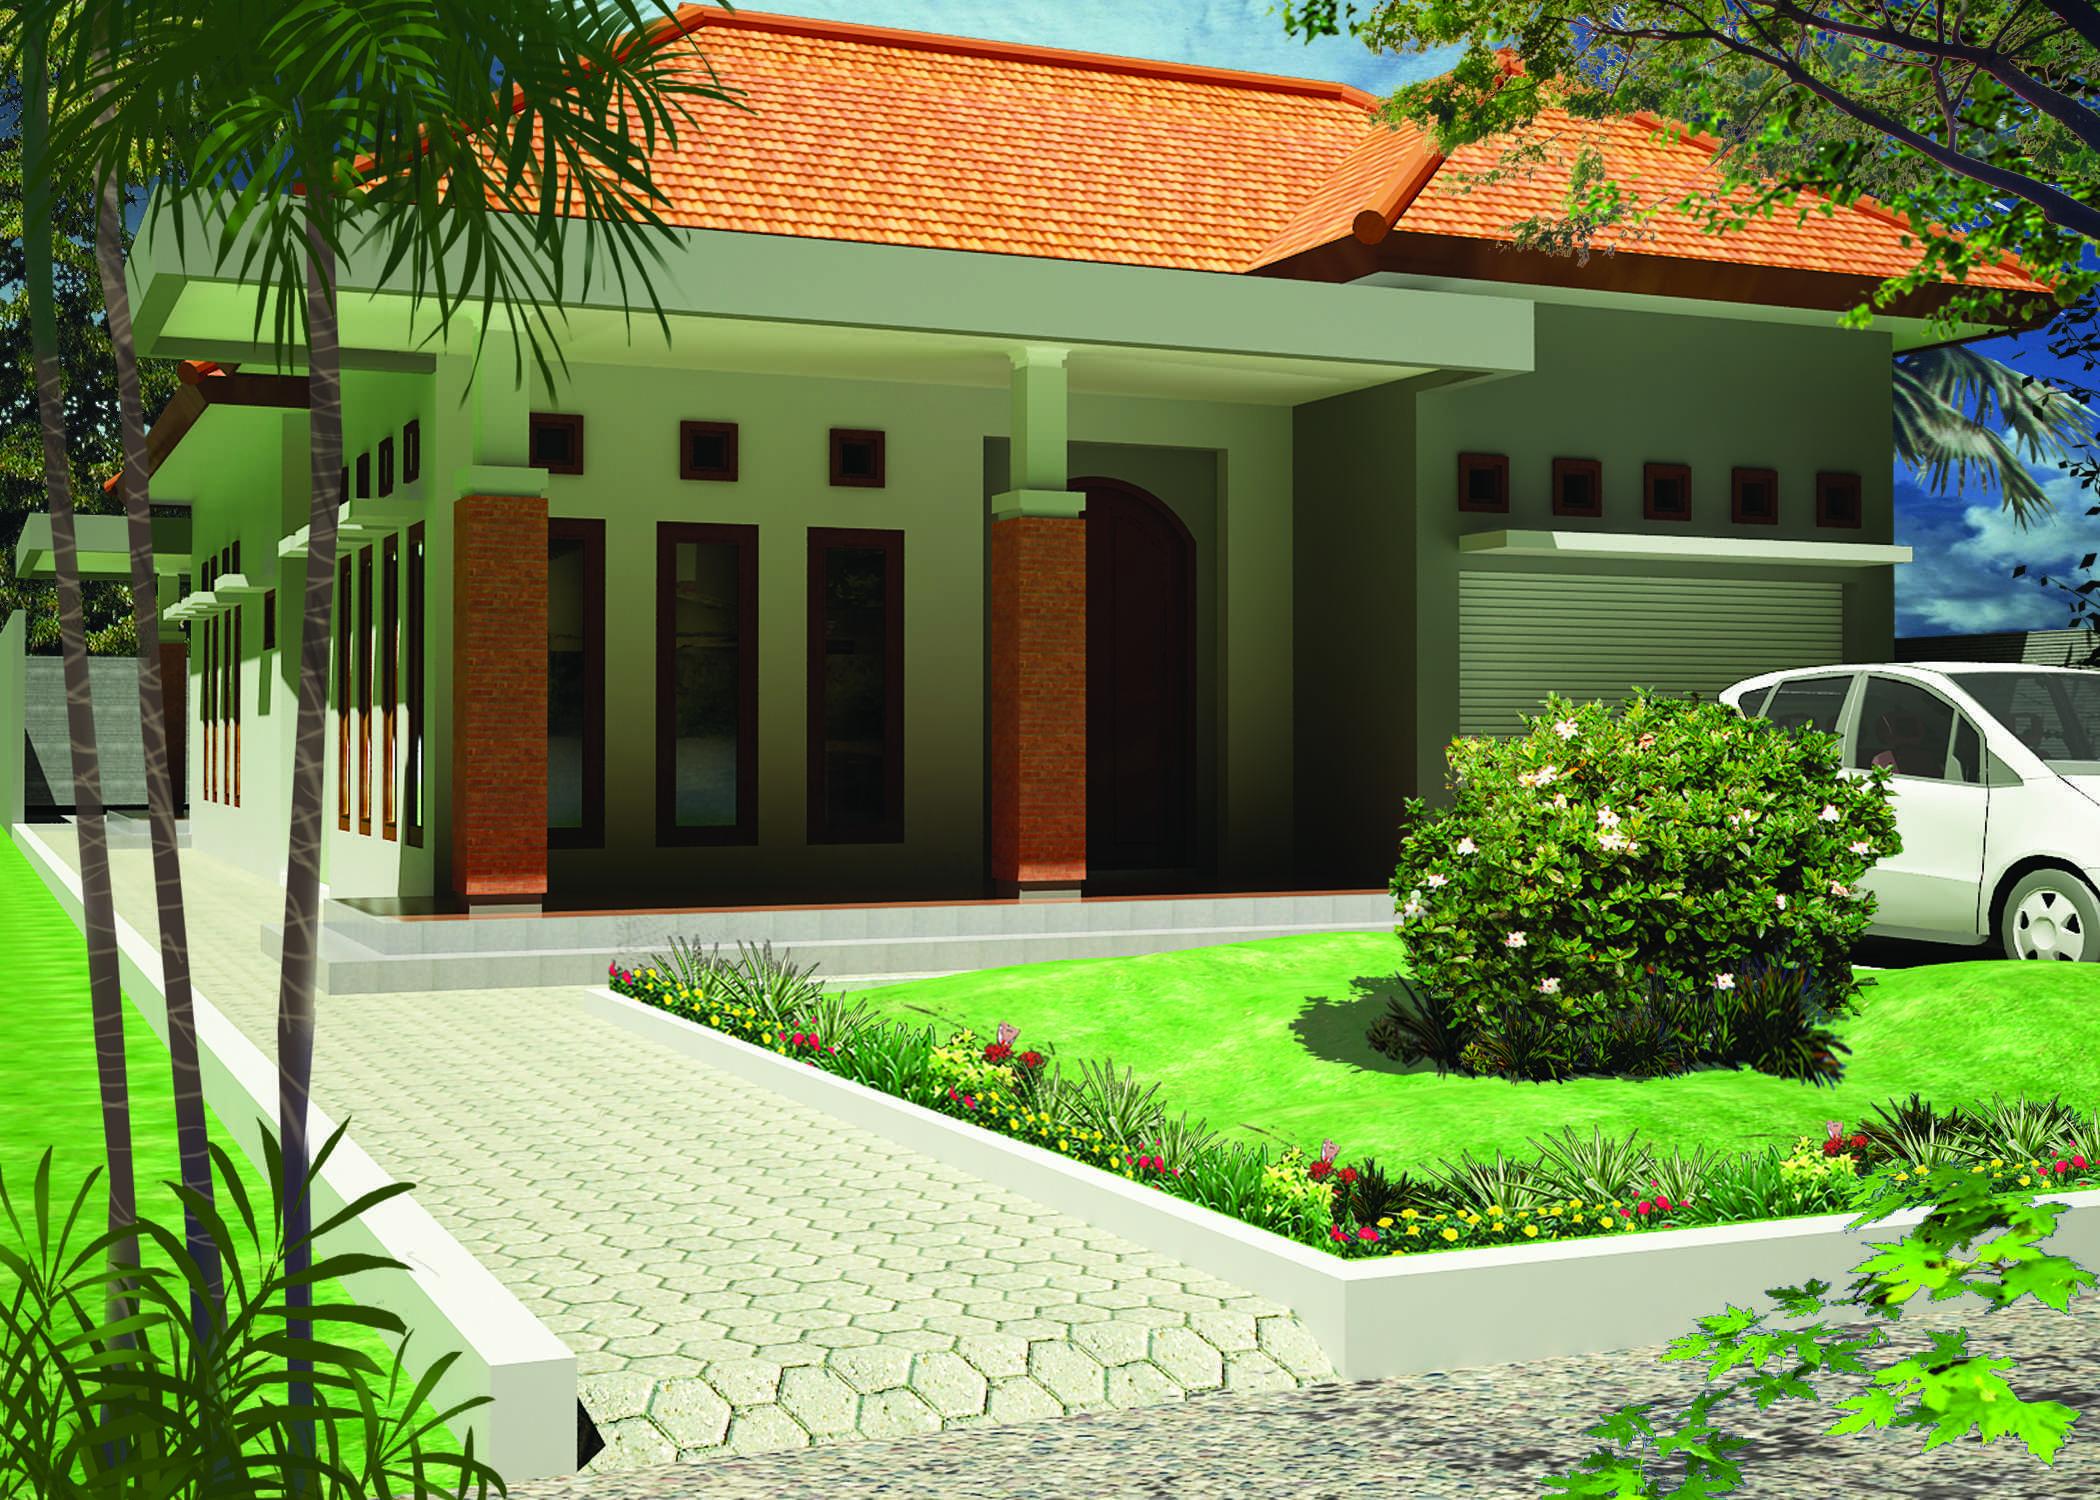 Marzal Rakhmadi Architects Bintuhan House Bengkulu Bengkulu Front View   10931